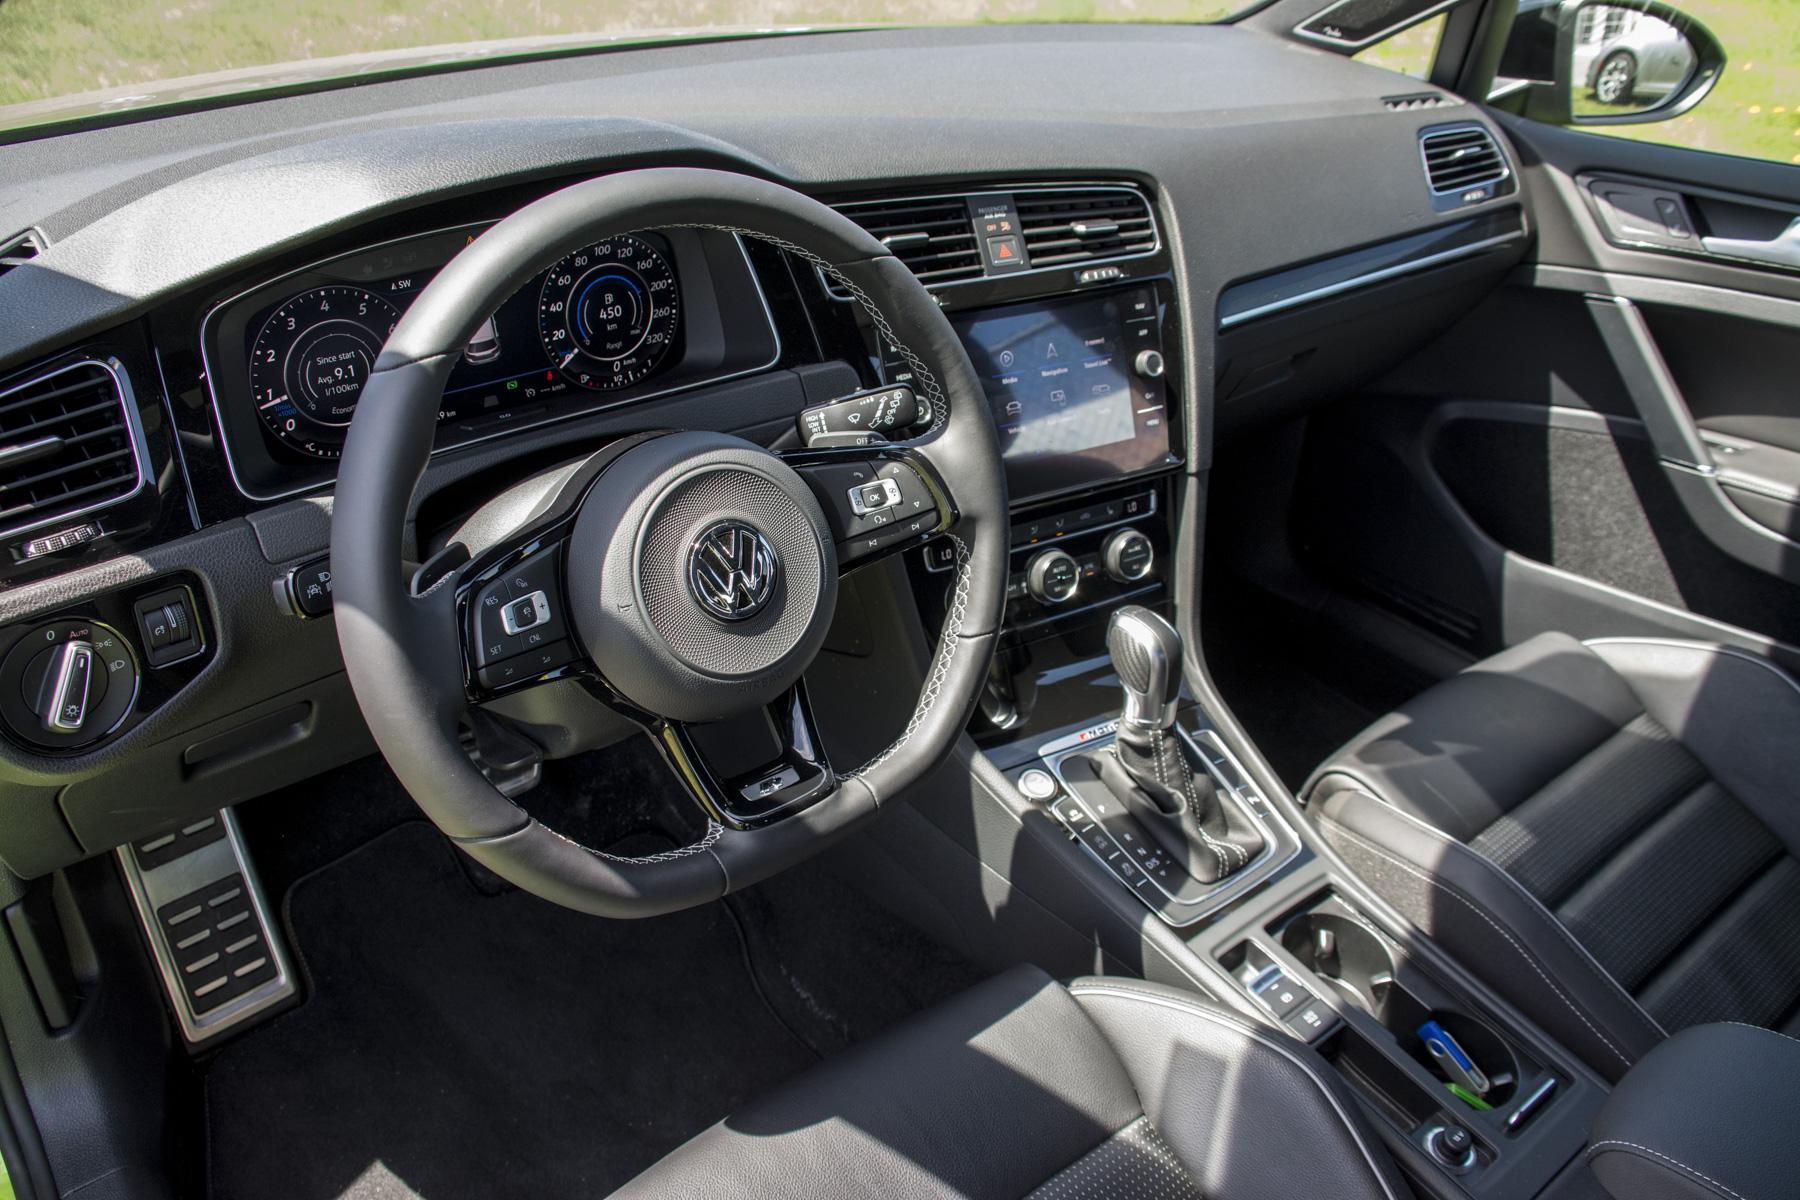 2018 Volkswagen Golf R (106)